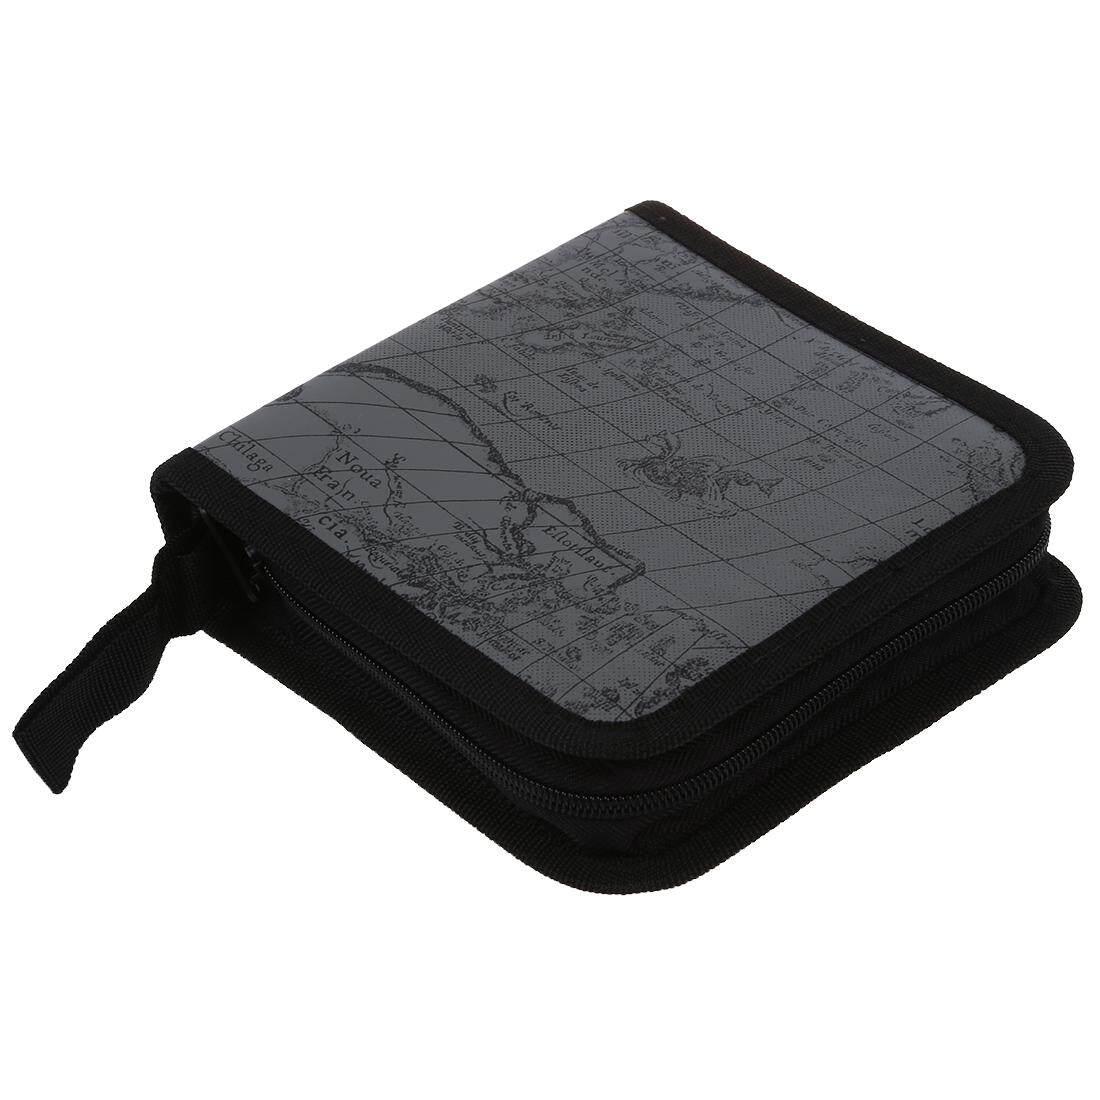 Buy Sell Cheapest Cd Wallet Best Quality Product Deals Plastik Wadah 40 Disc Fashion Map Dvd Storage Holder Sleeve Case Box Bag Album Zipper